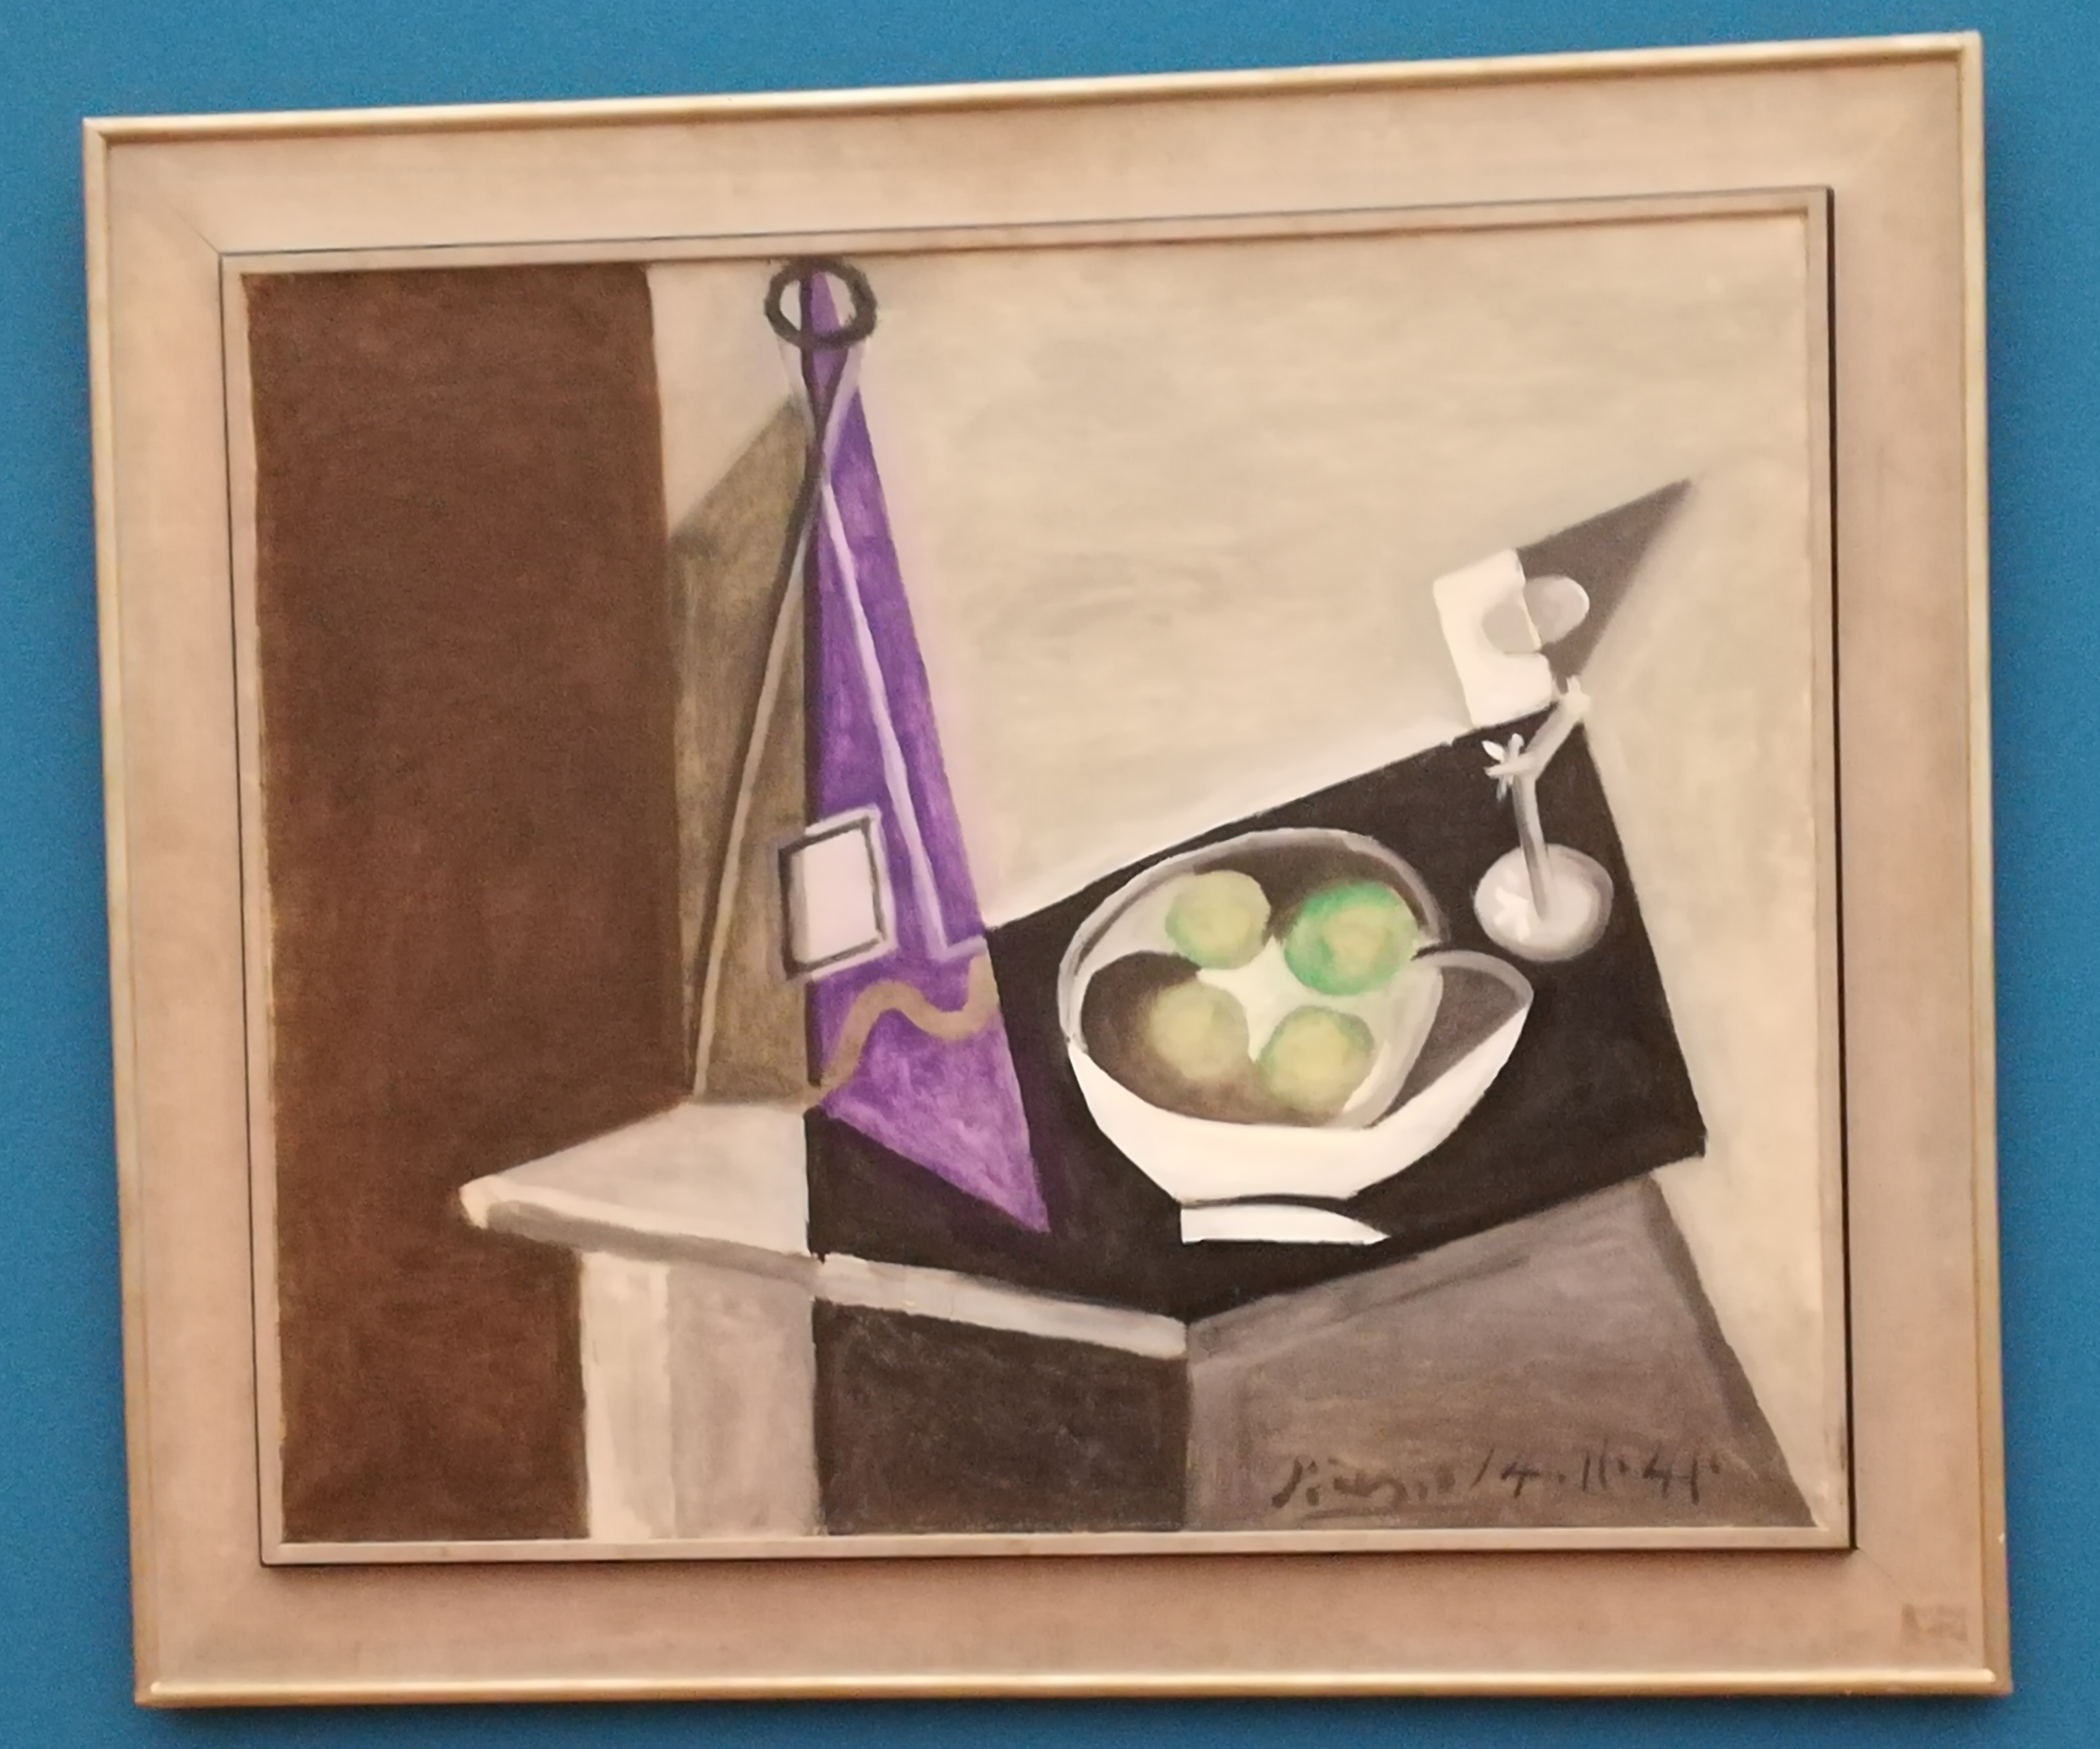 Exposition Picasso Novembre 2019